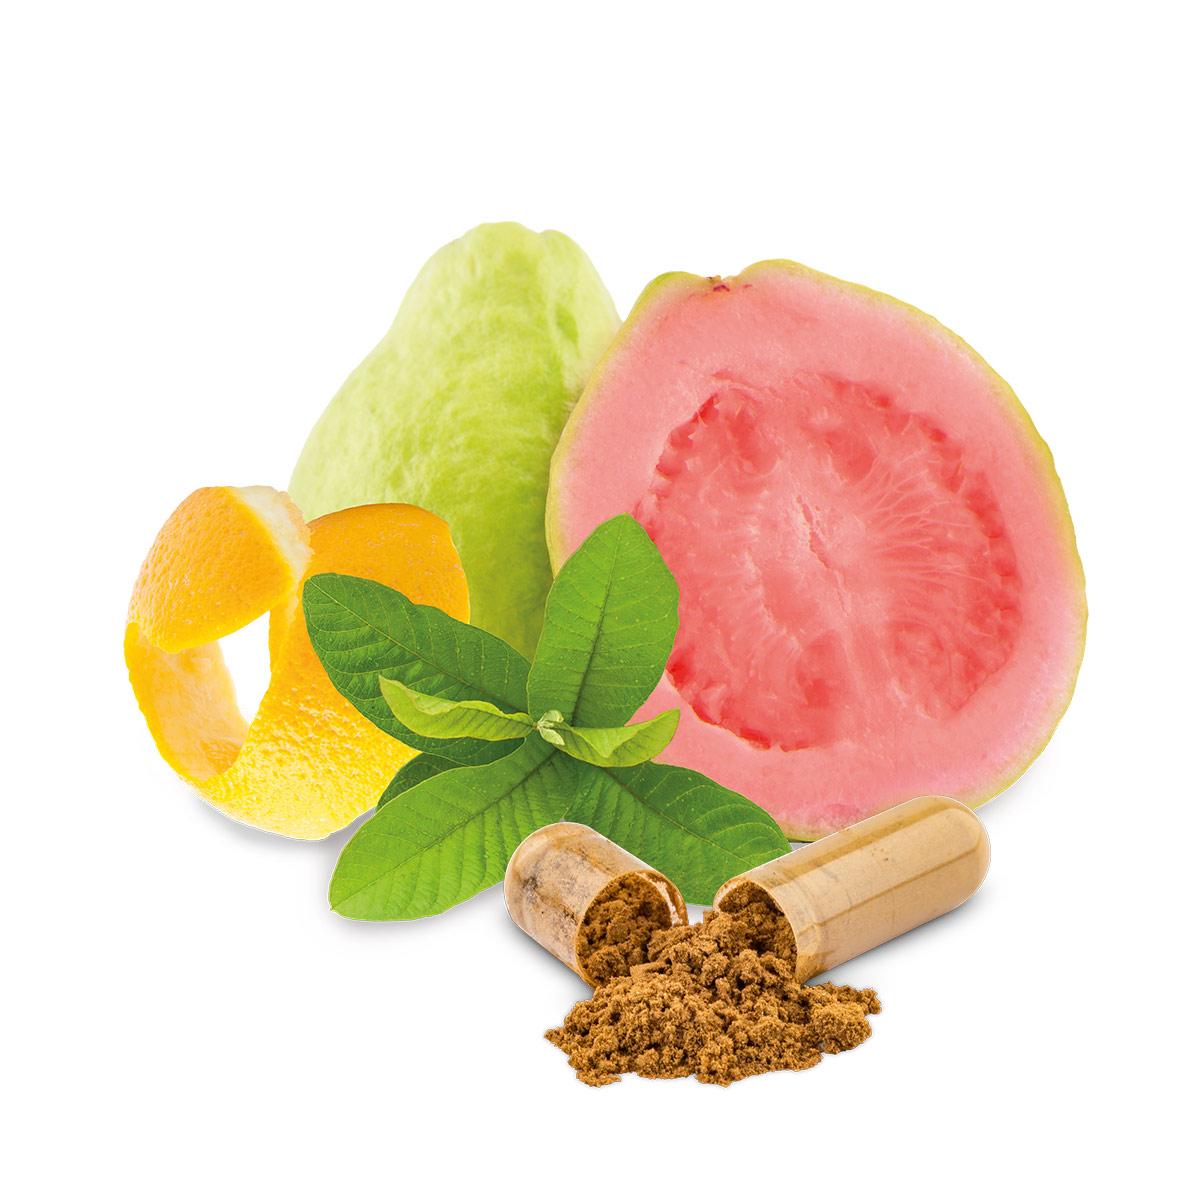 vitamin-b-kapseln-bio-rein-pflanzlich-phytholistic-90-stueck-guave-zitronenschale-basilikum-kapsel-1200x1200